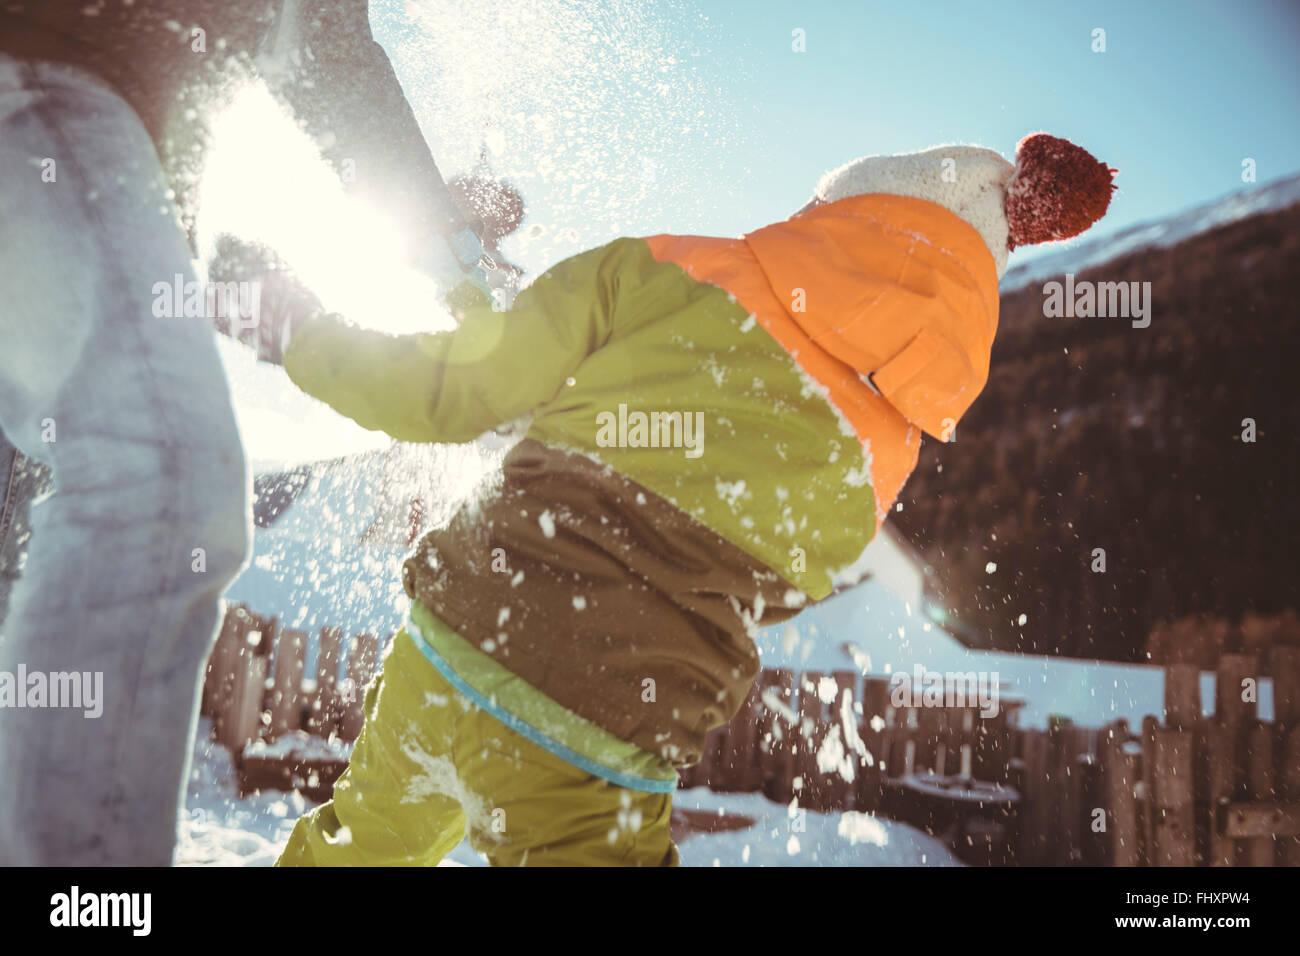 Italia, Val Venosta, Slingia, padre e hijo, tener una pelea con bolas de nieve Imagen De Stock